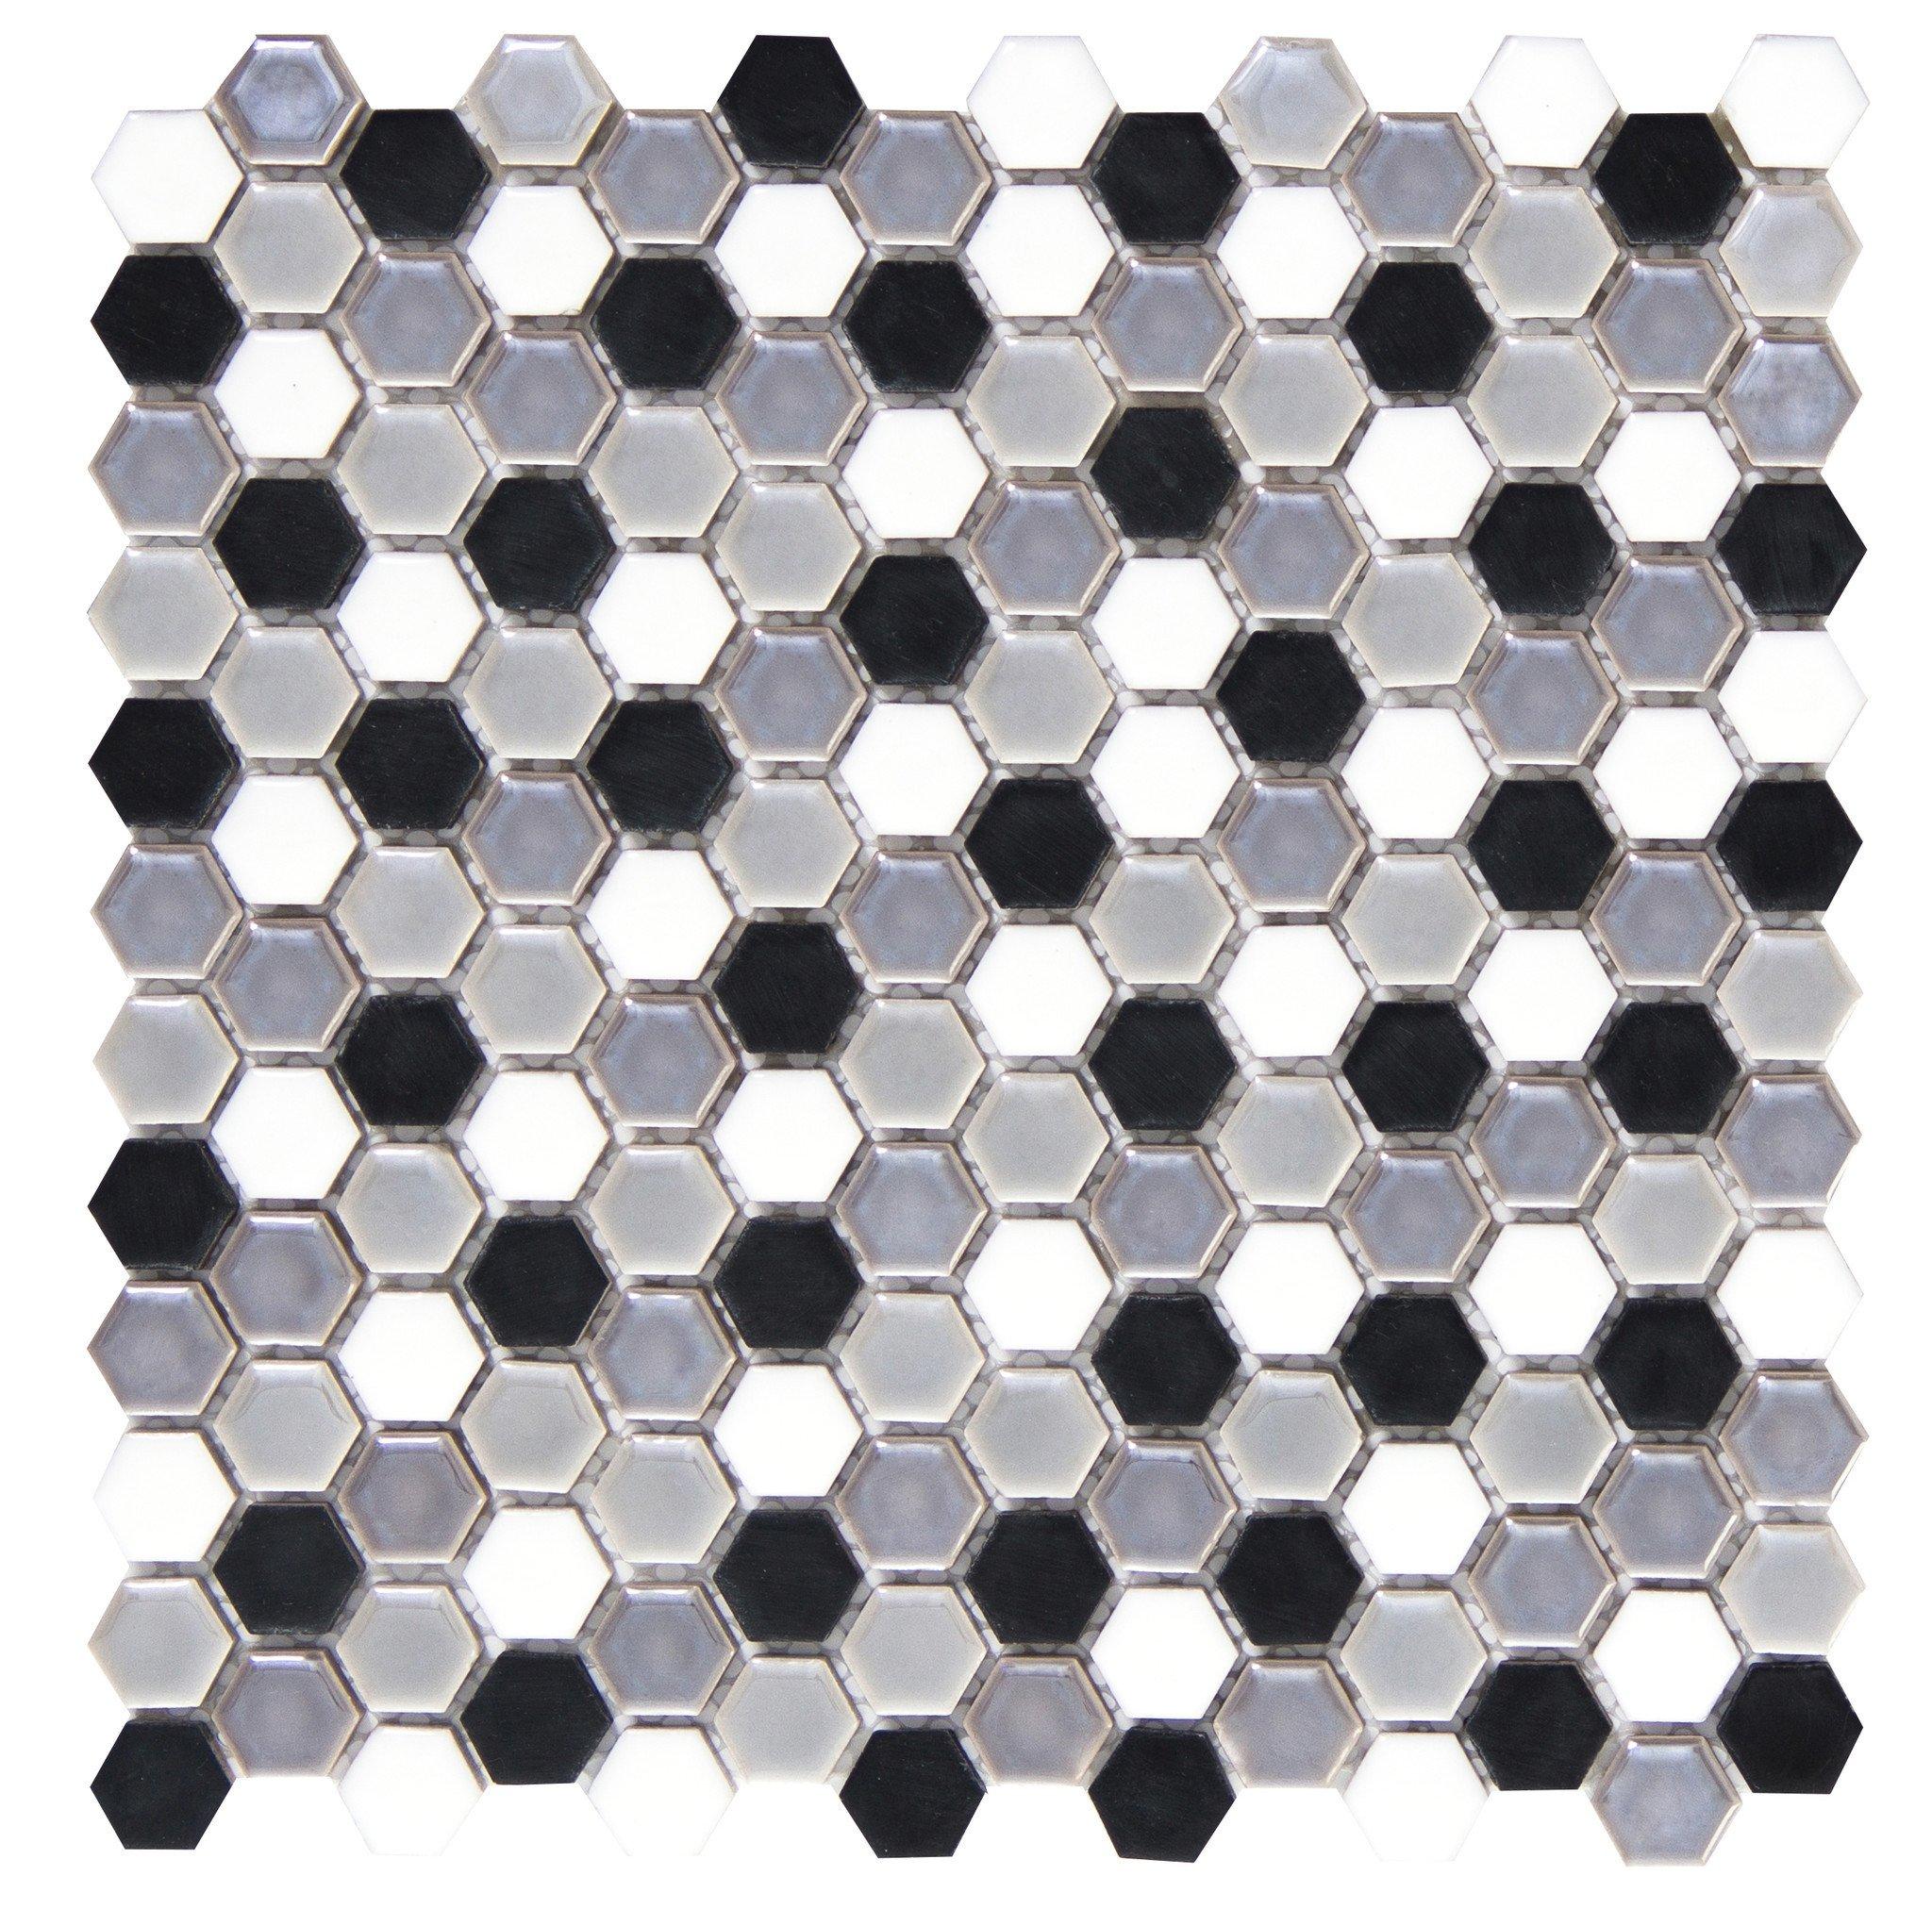 Confetti 12 Mosaic Wall Tiles Stone Mosaic Tile Mosaic Tiles